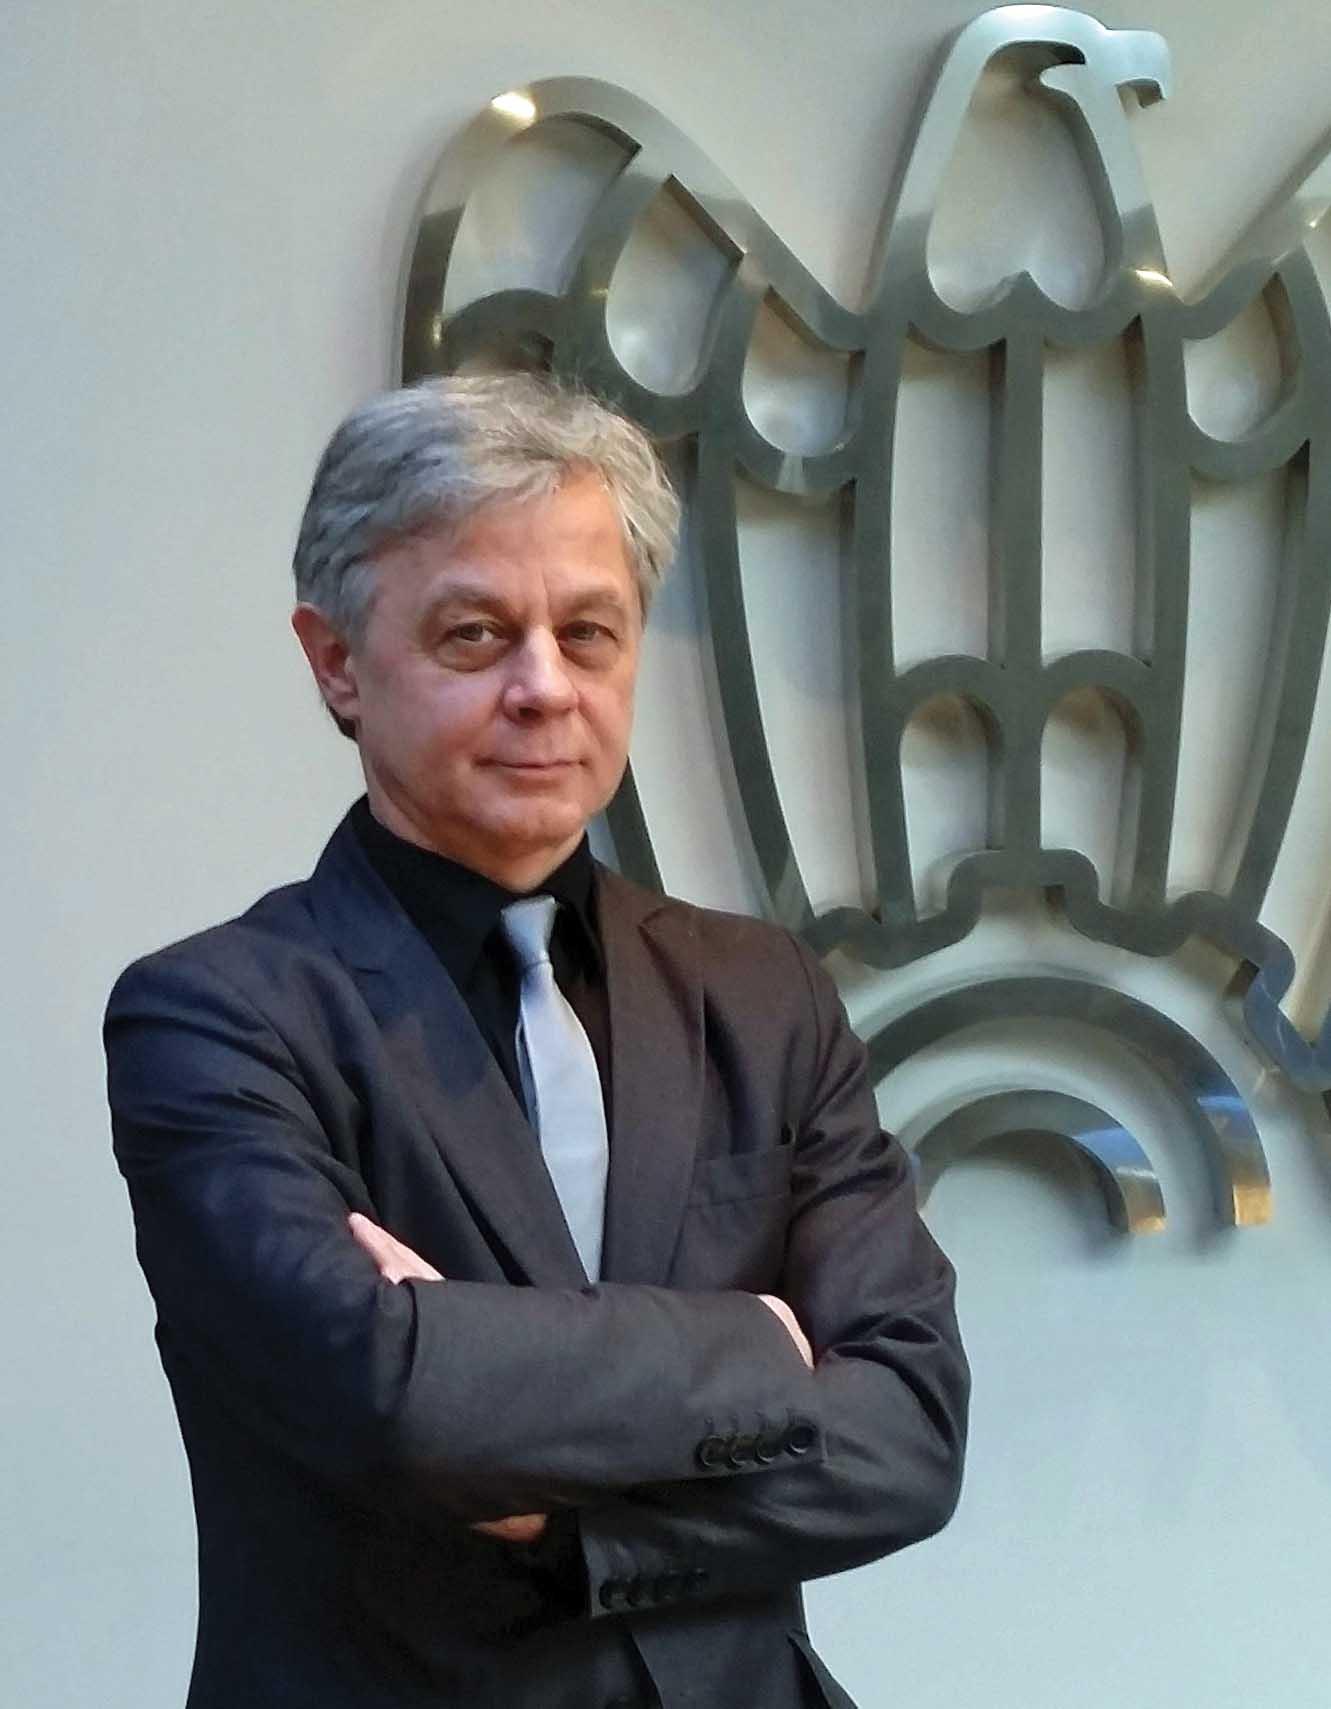 PaoloToselli presidente Aiop Modena confindustria 1